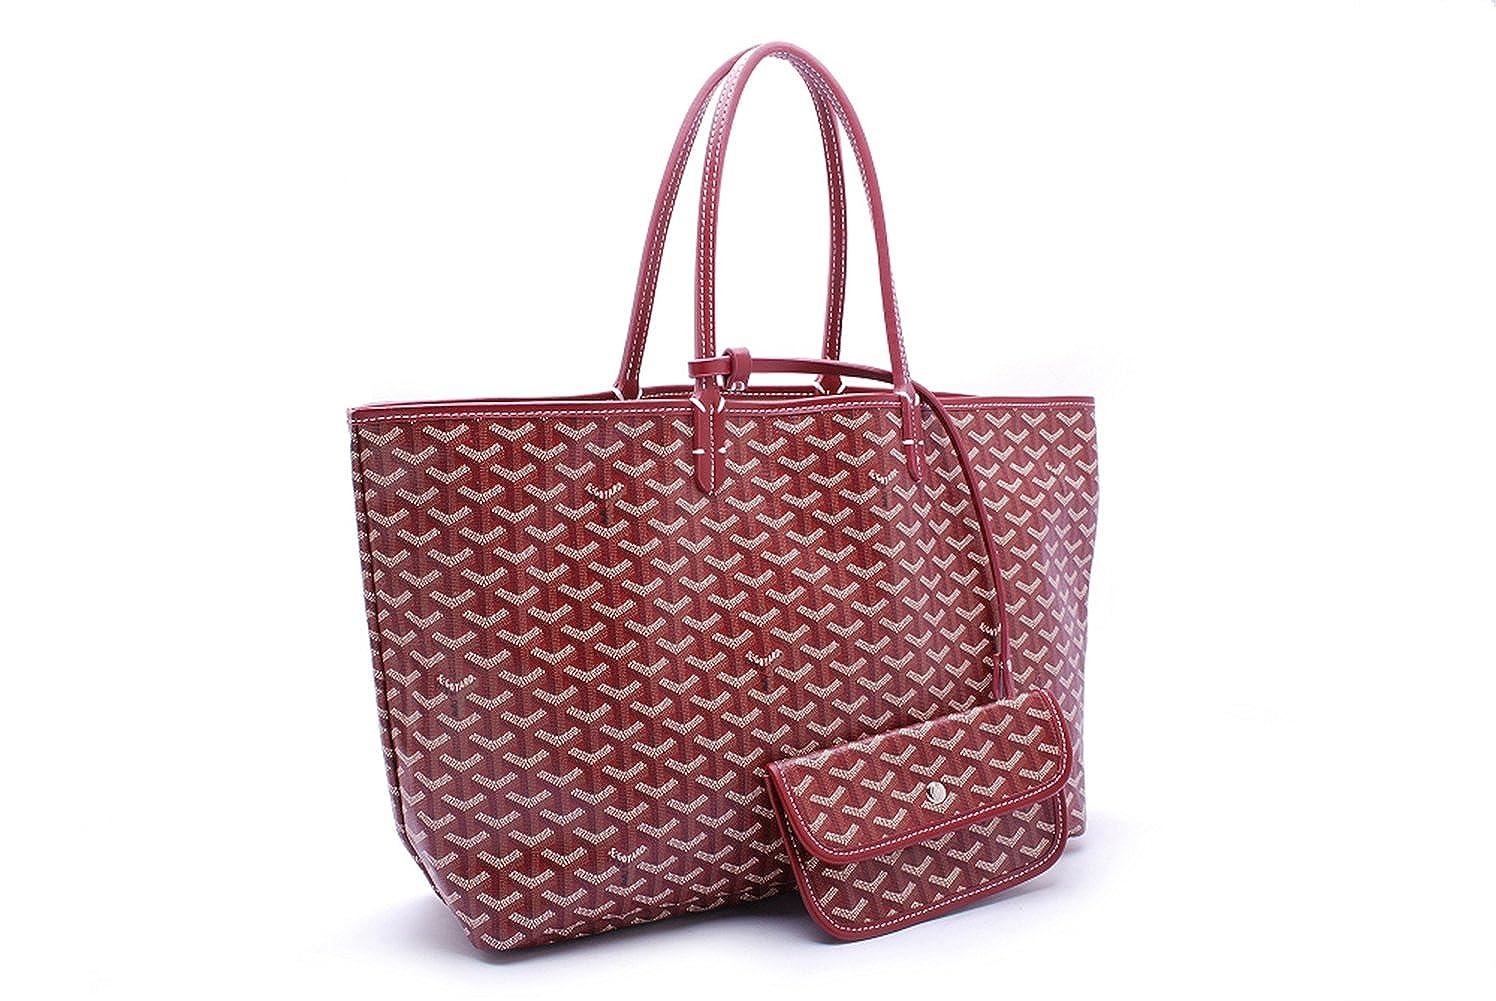 585a2312ae Amazon.com  Bagcollector Fashion Shopping Shoulder Tote Bag Set(Black)   Shoes